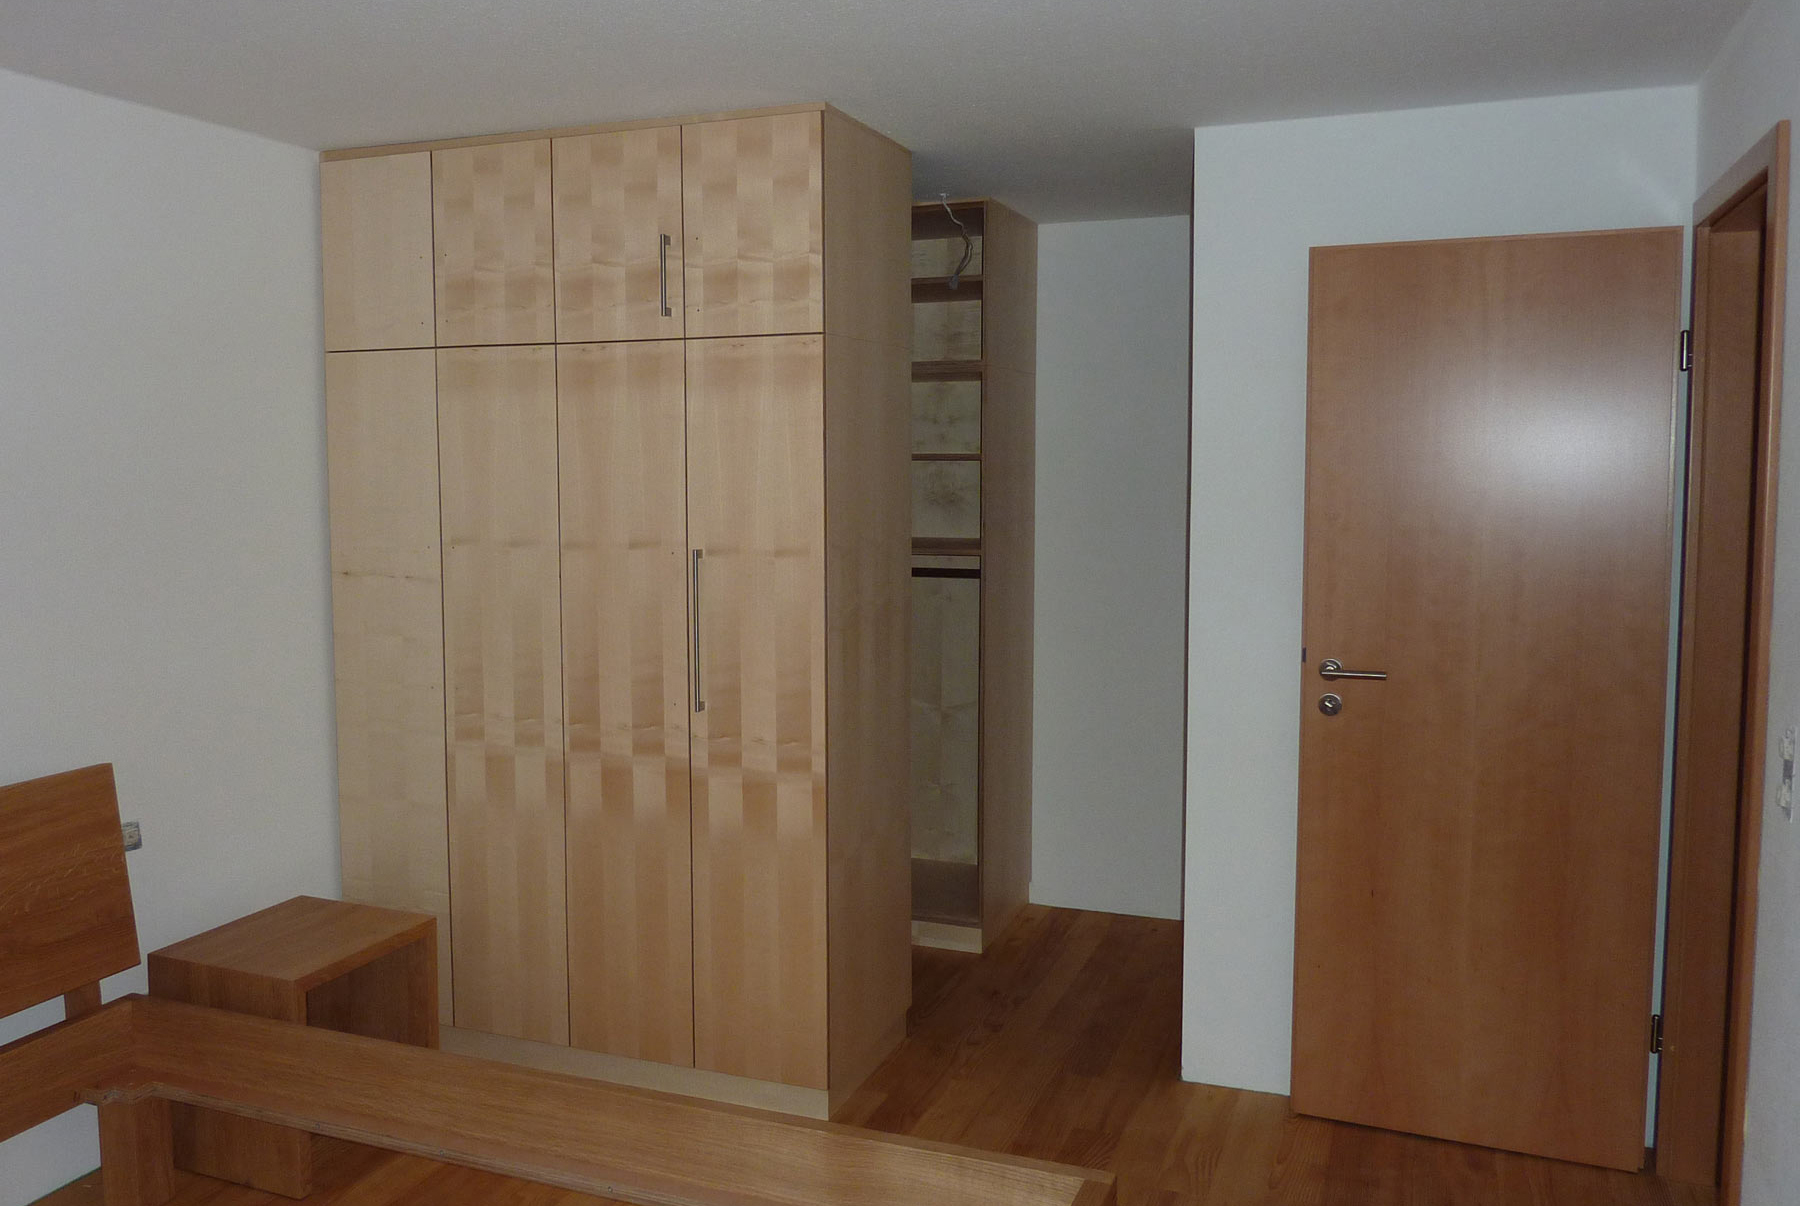 ahorn schrank great arte m kick ahorndekor with ahorn. Black Bedroom Furniture Sets. Home Design Ideas